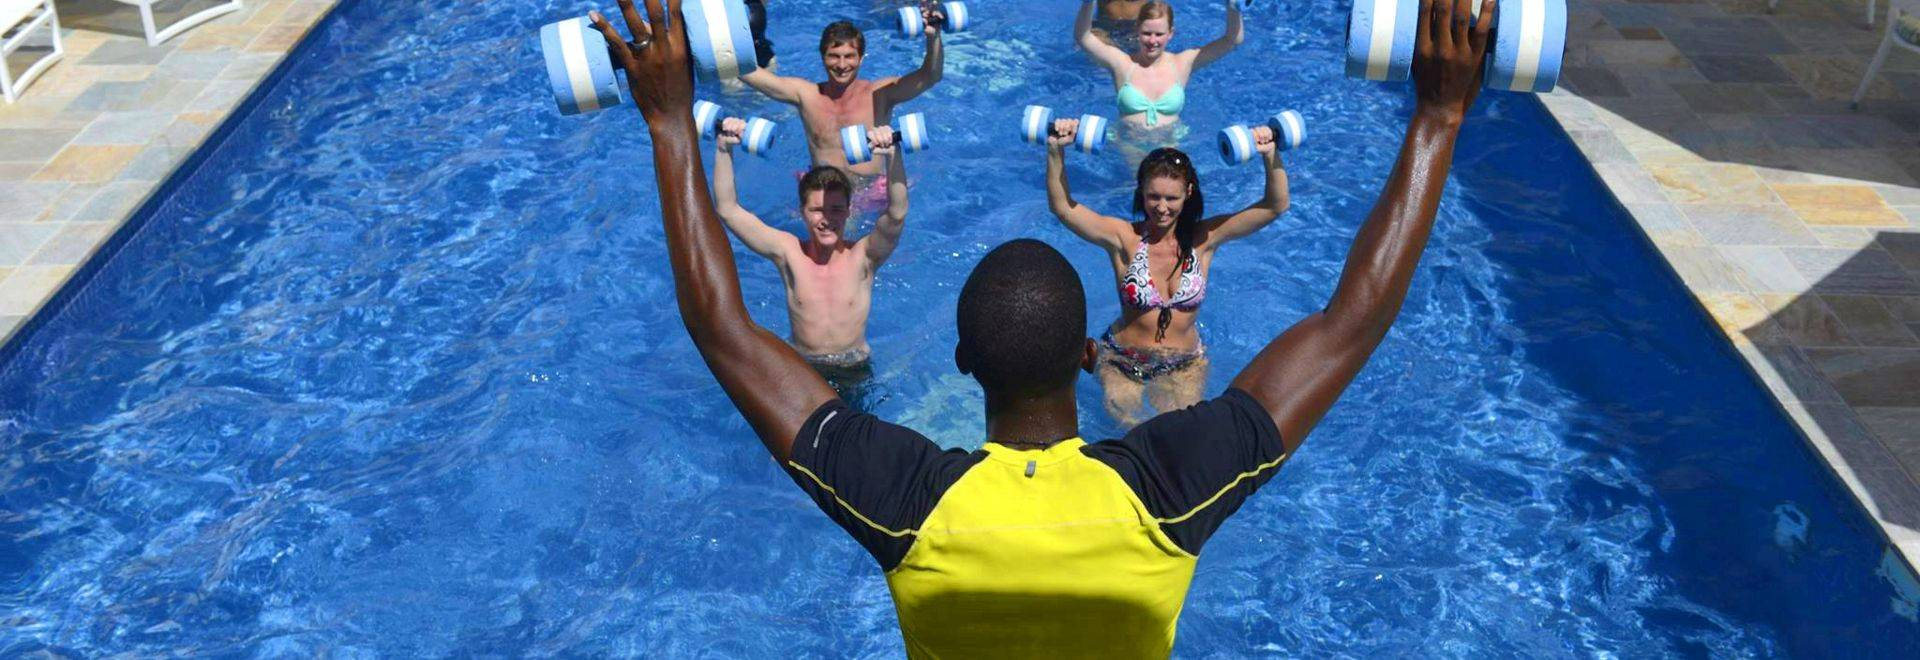 The BodyHoliday AquaFit